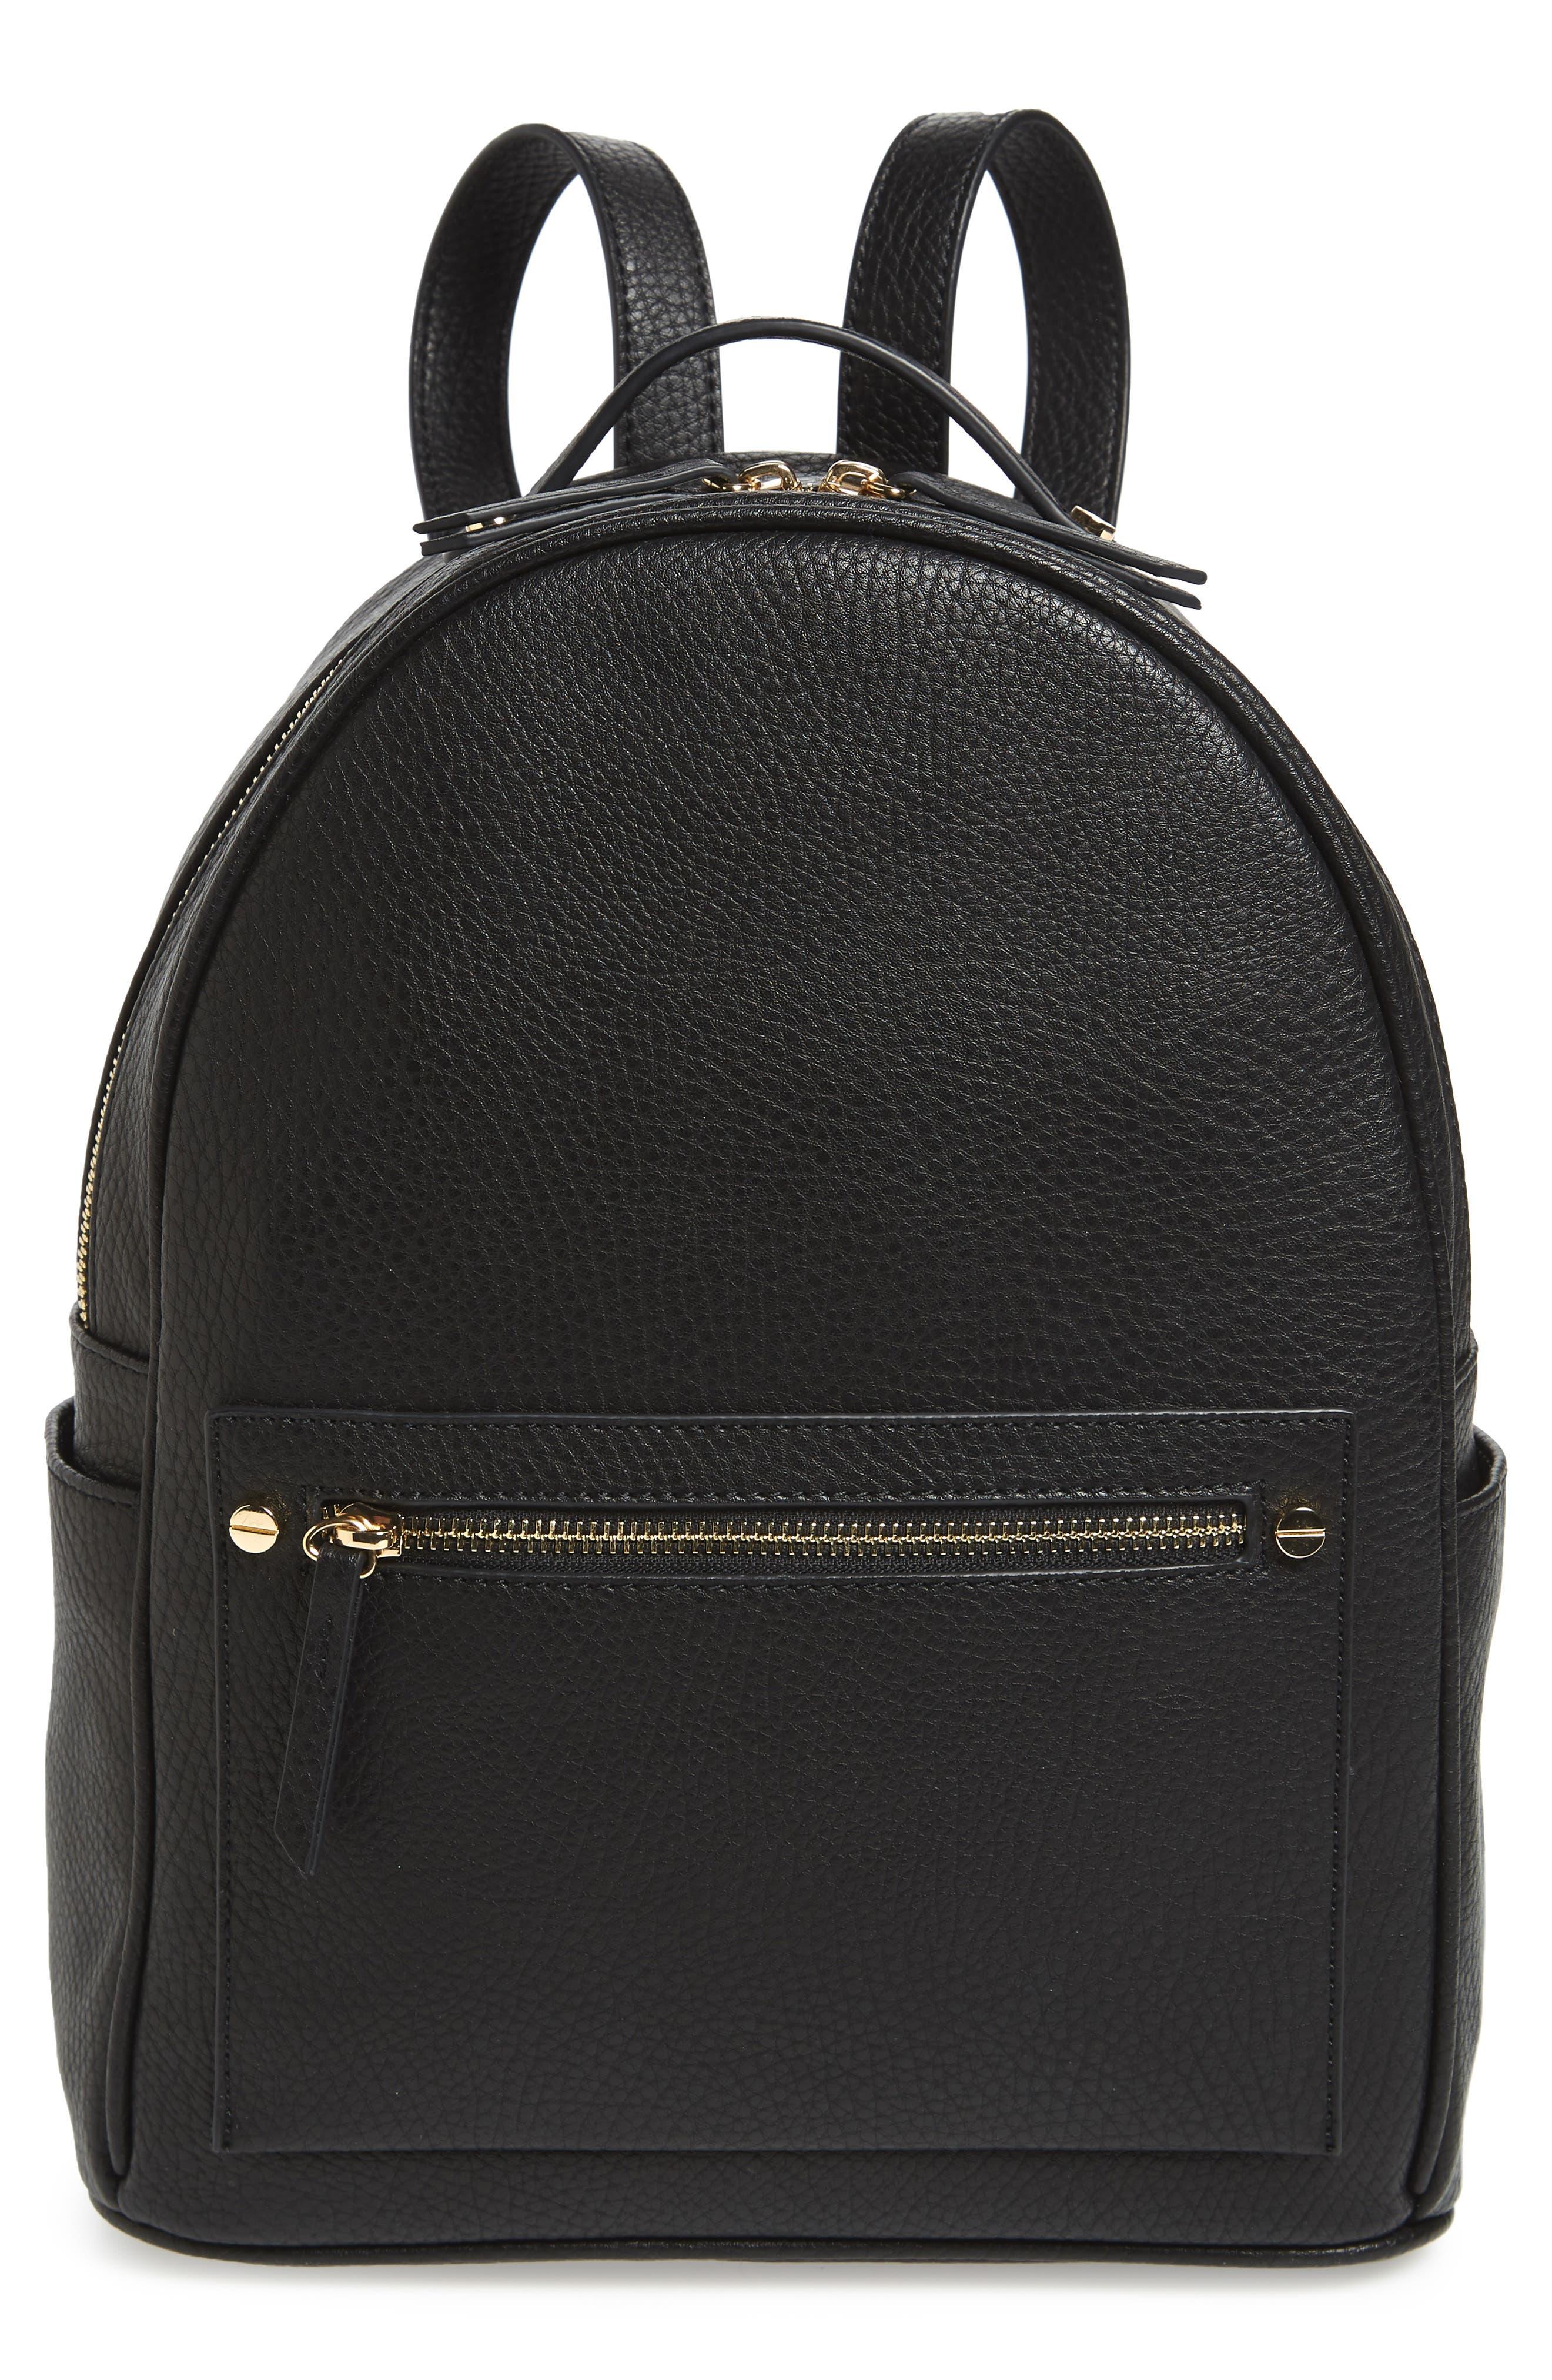 Mali + Lili Madison Vegan Leather Backpack,                         Main,                         color,